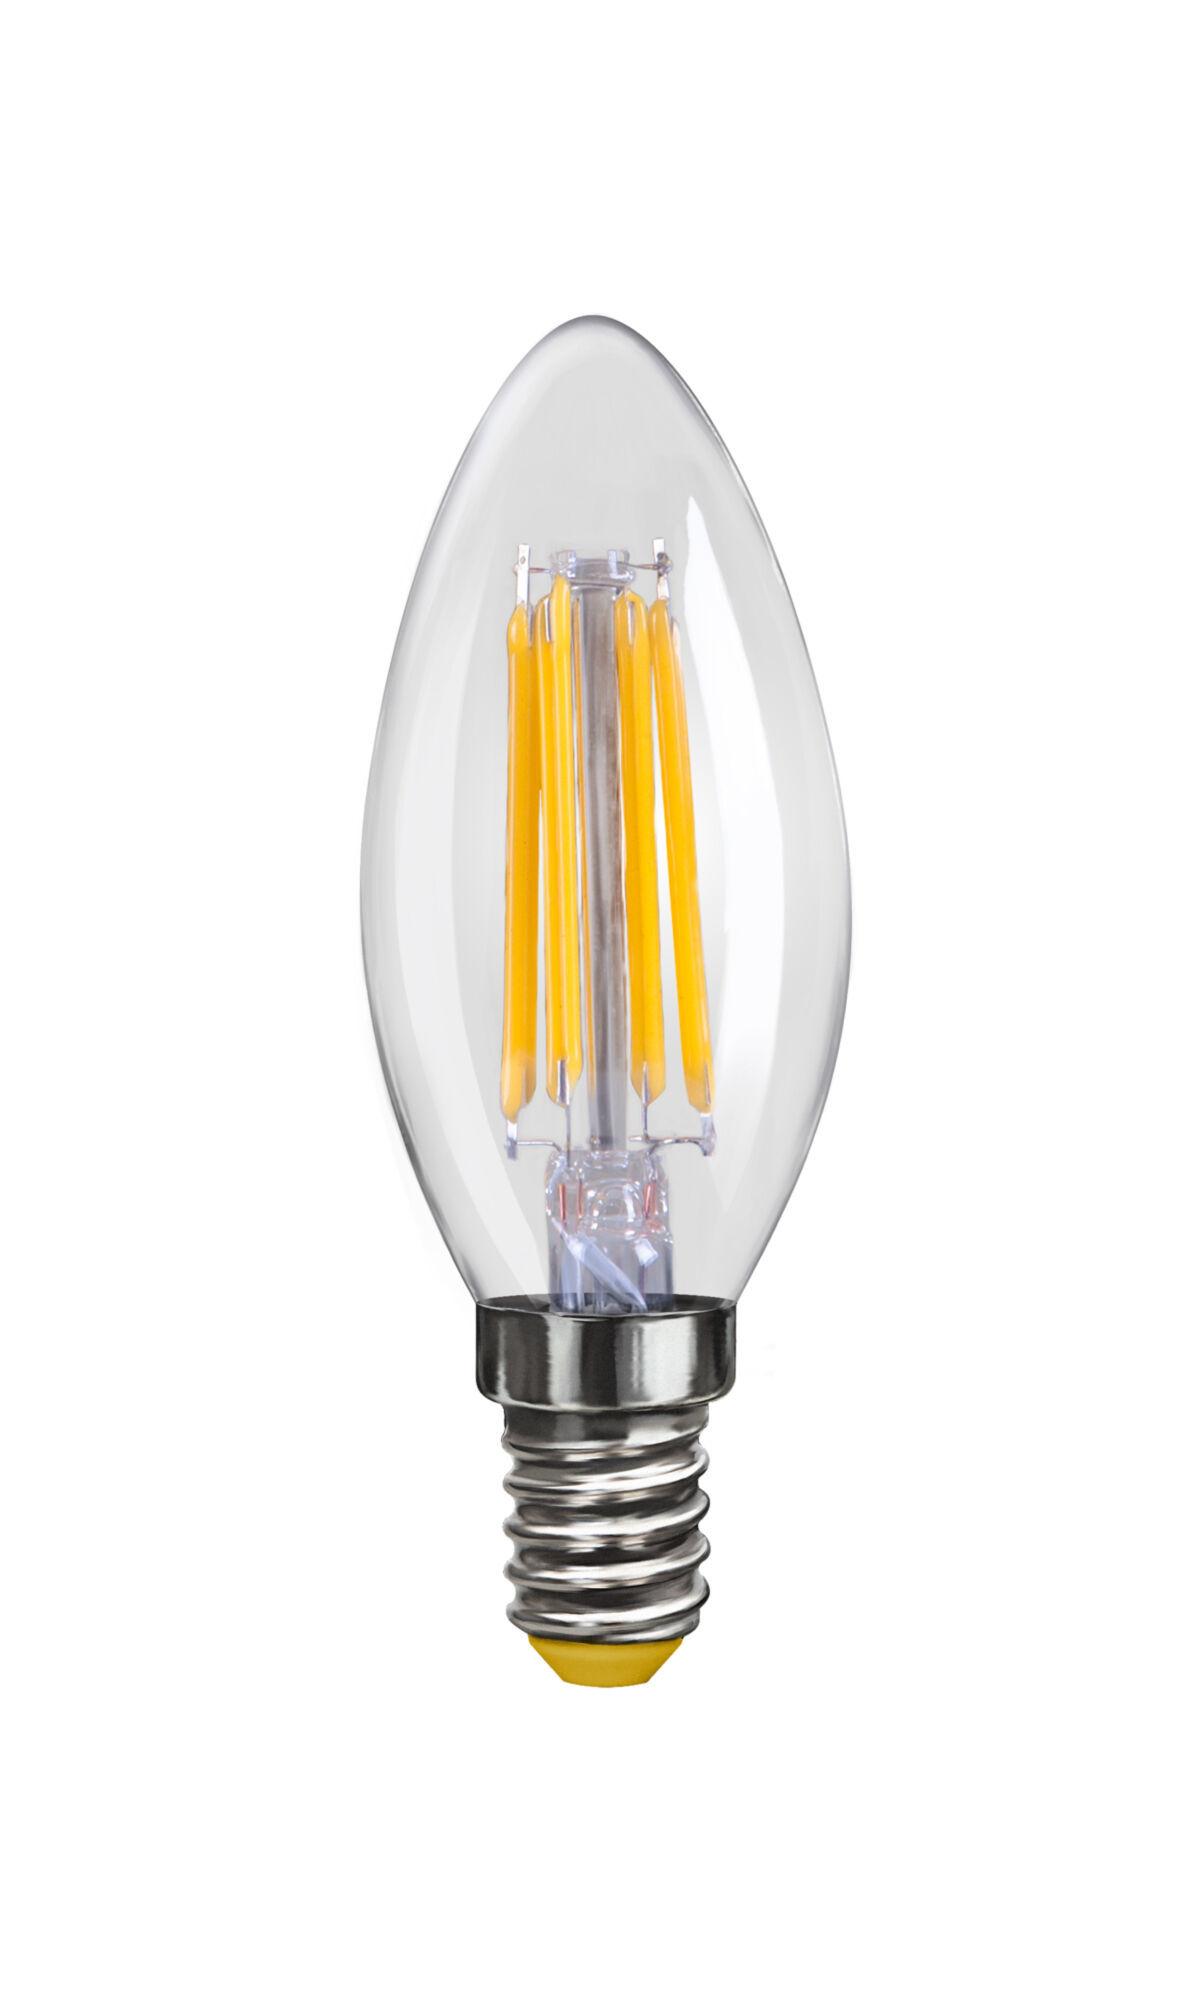 Филаментная светодиодная лампа Voltega VG10-C1E14warm4W-F 6997 свеча E14 4W, 2800K (теплый), гарантия 3 года - фото 1